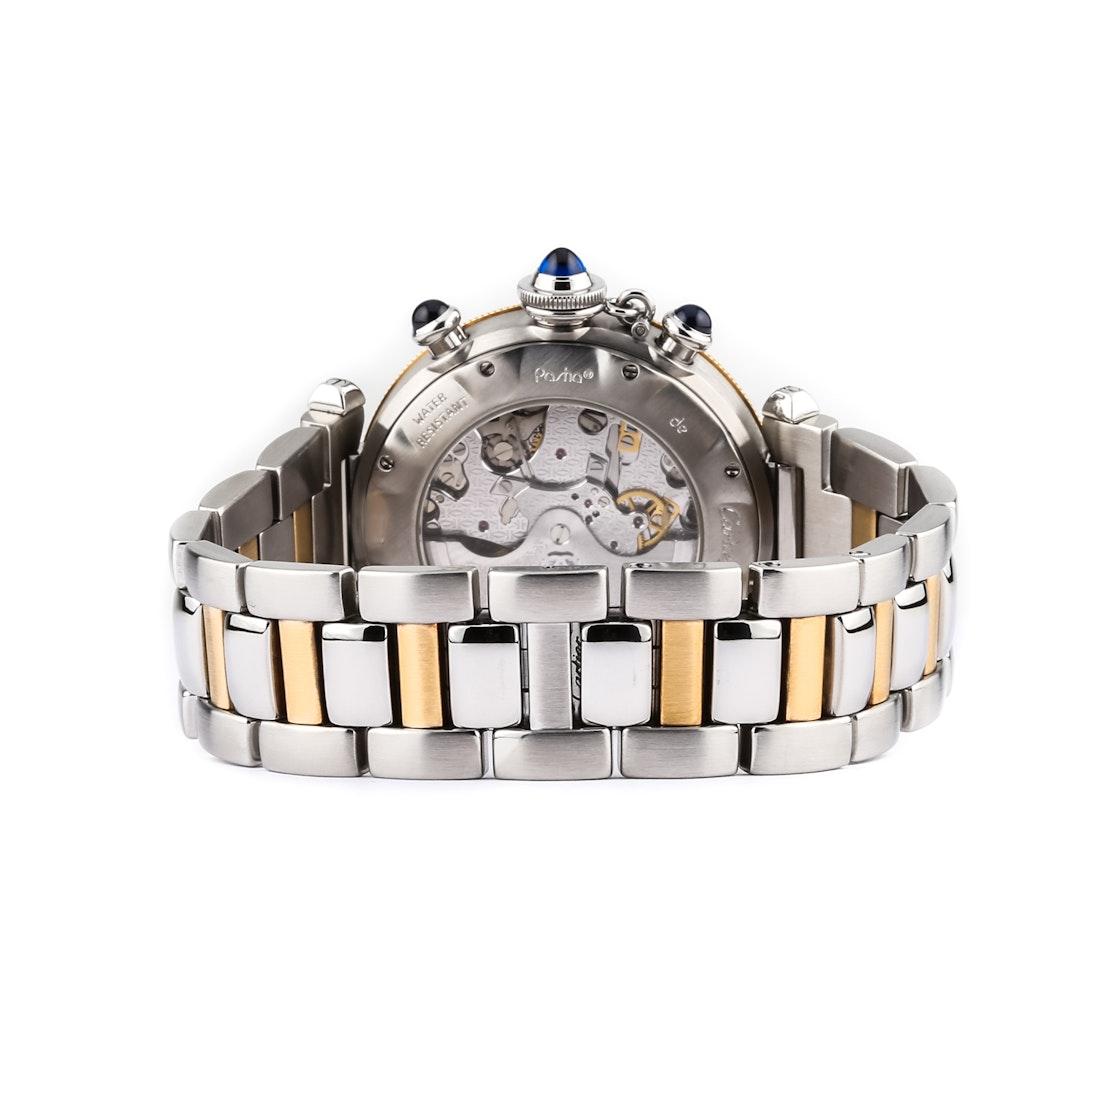 Cartier Pasha Chronograph W31036T6